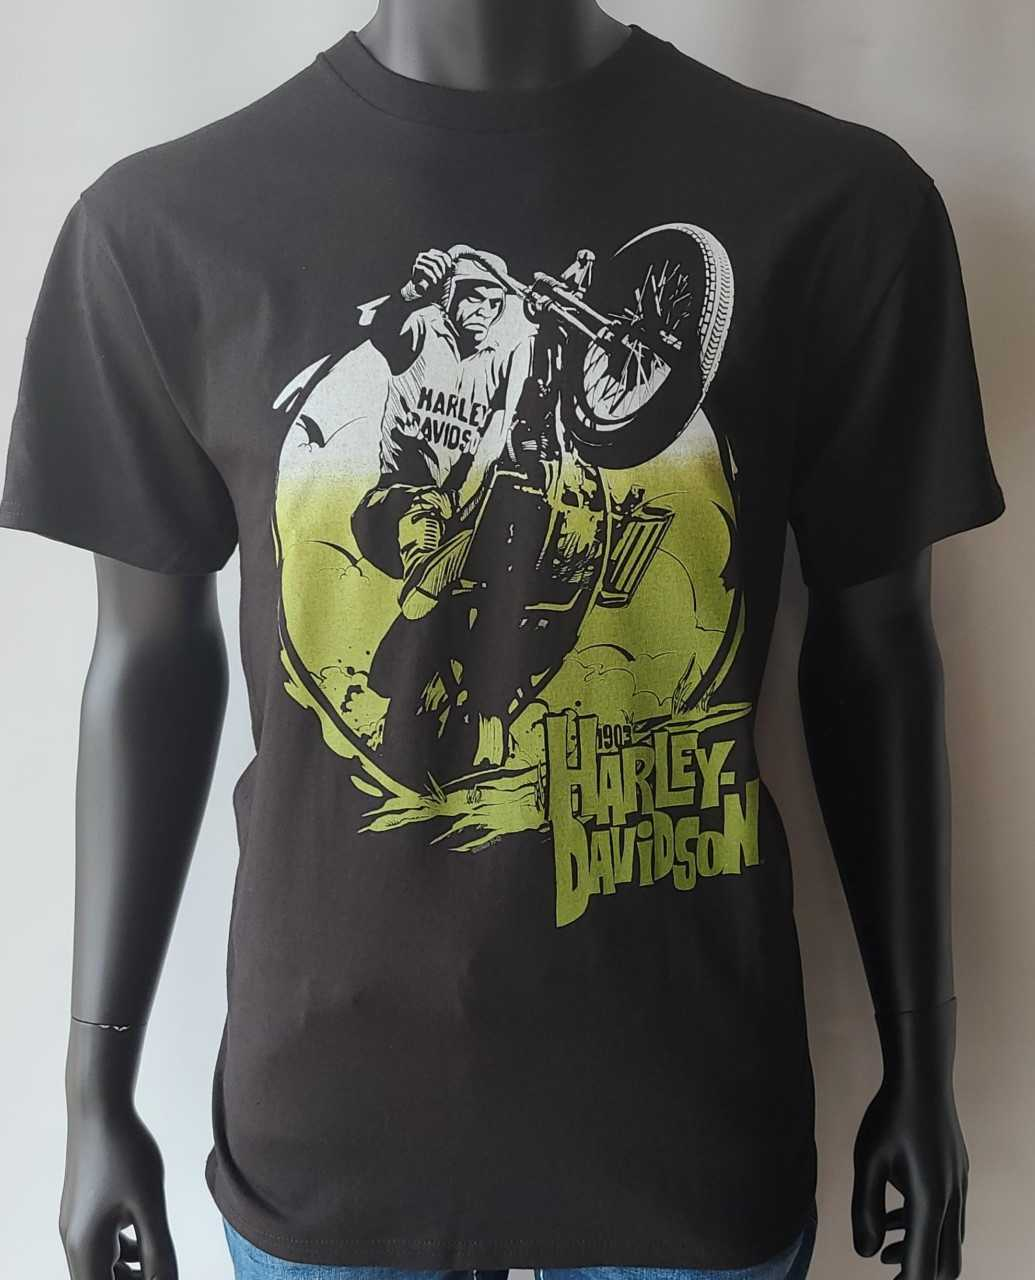 HARLEY DAVIDSON BLACK*RUN THE GEARS